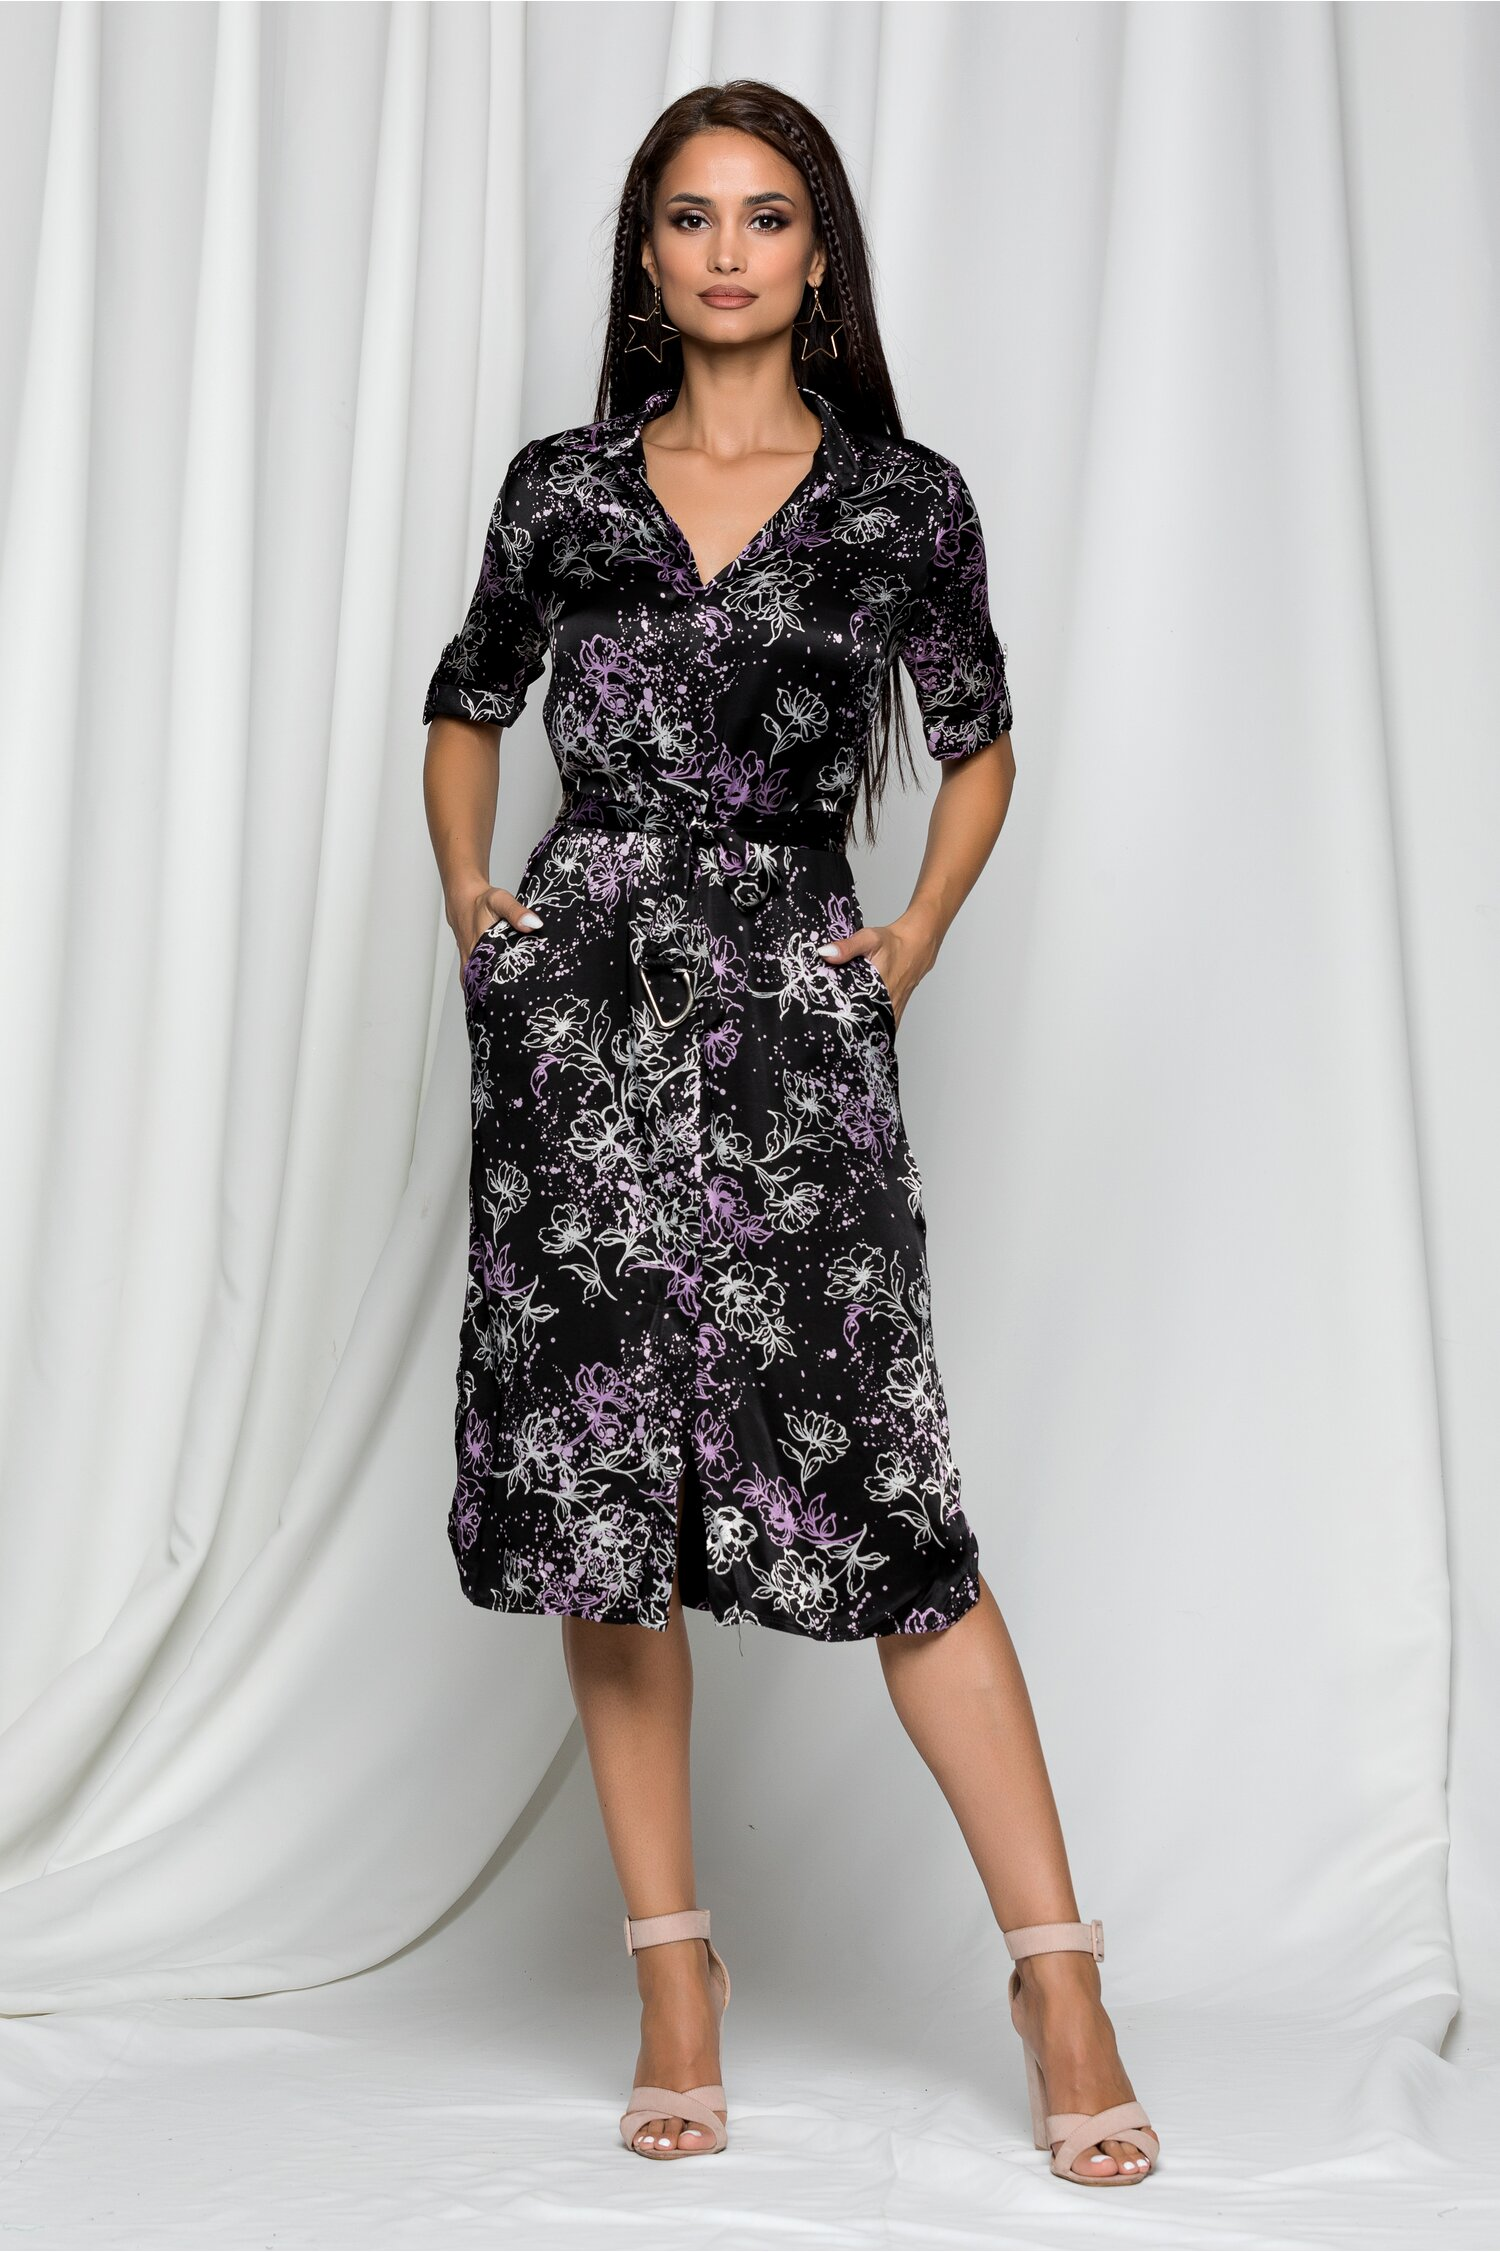 Rochie Fabia neagra tip camasa din material satinat cu imprimeu floral mov